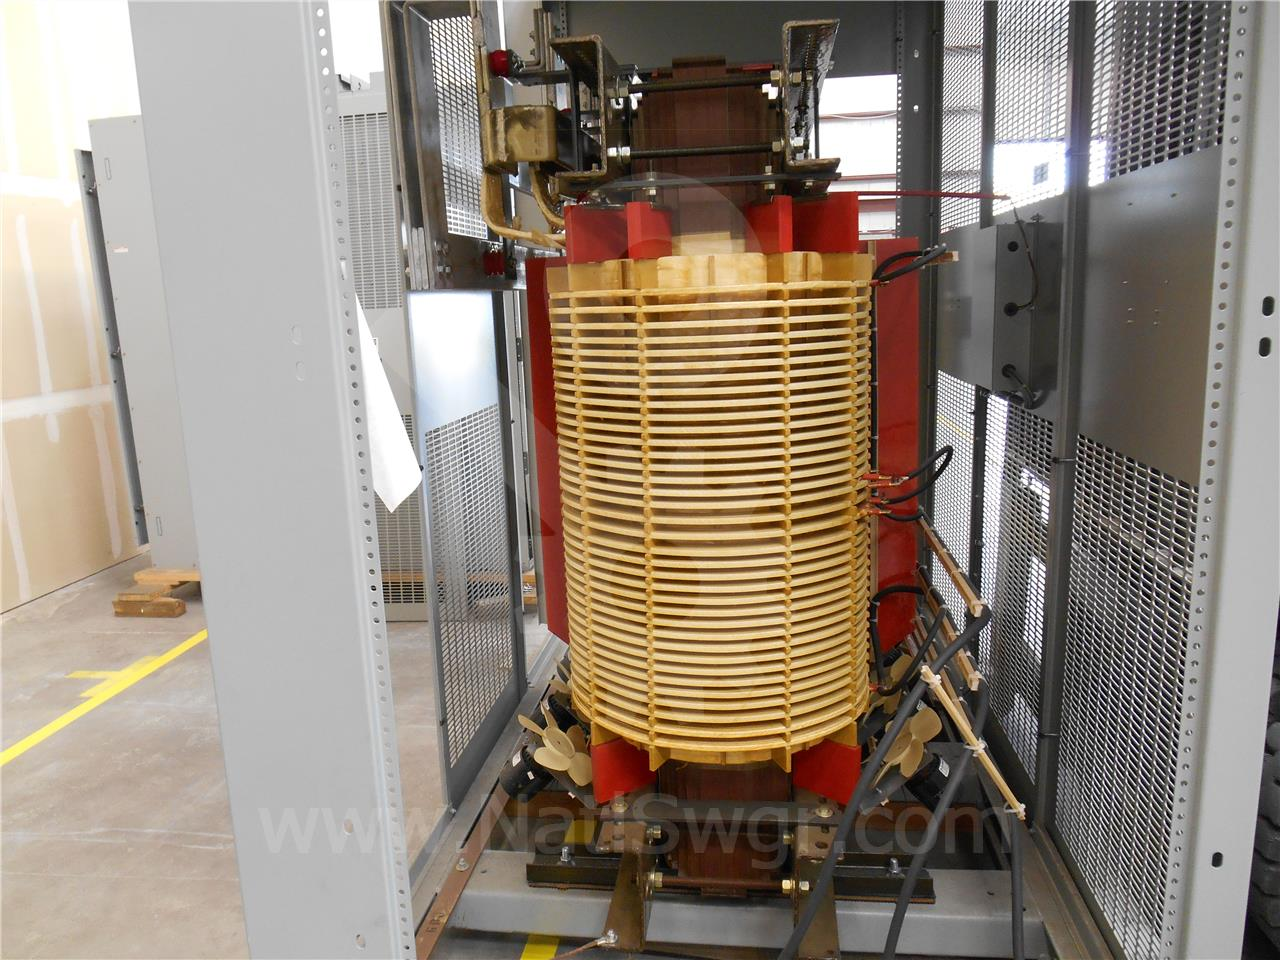 Westinghouse / Cutler Hammer CH 3000/4000KVA 13200:480V DRY 3PH POWER TRANSFORMER UNUSED SURPLUS